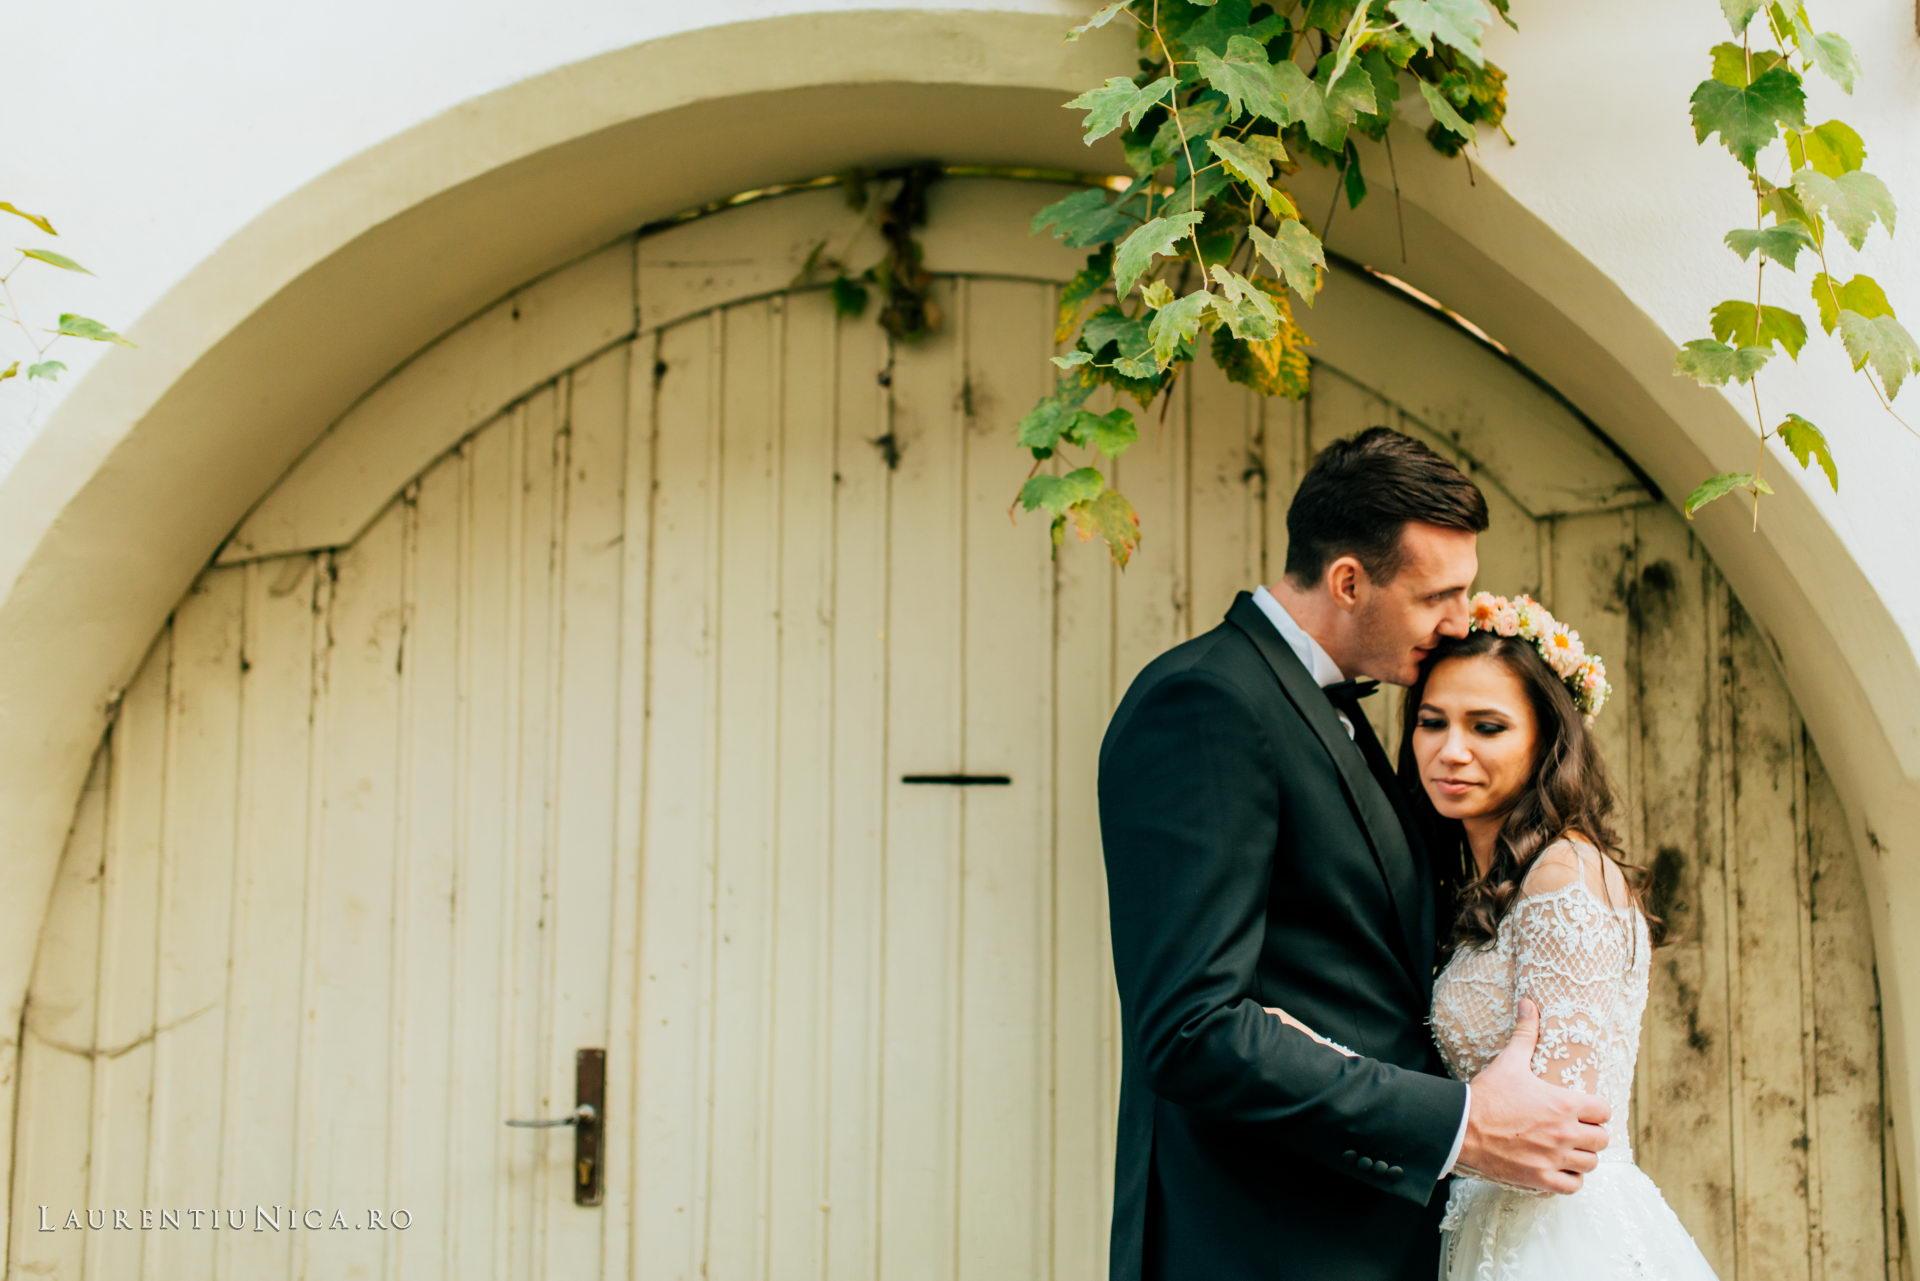 lili-si-dan-fotografii-nunta-after-wedding-sighisoara-laurentiu-nica42